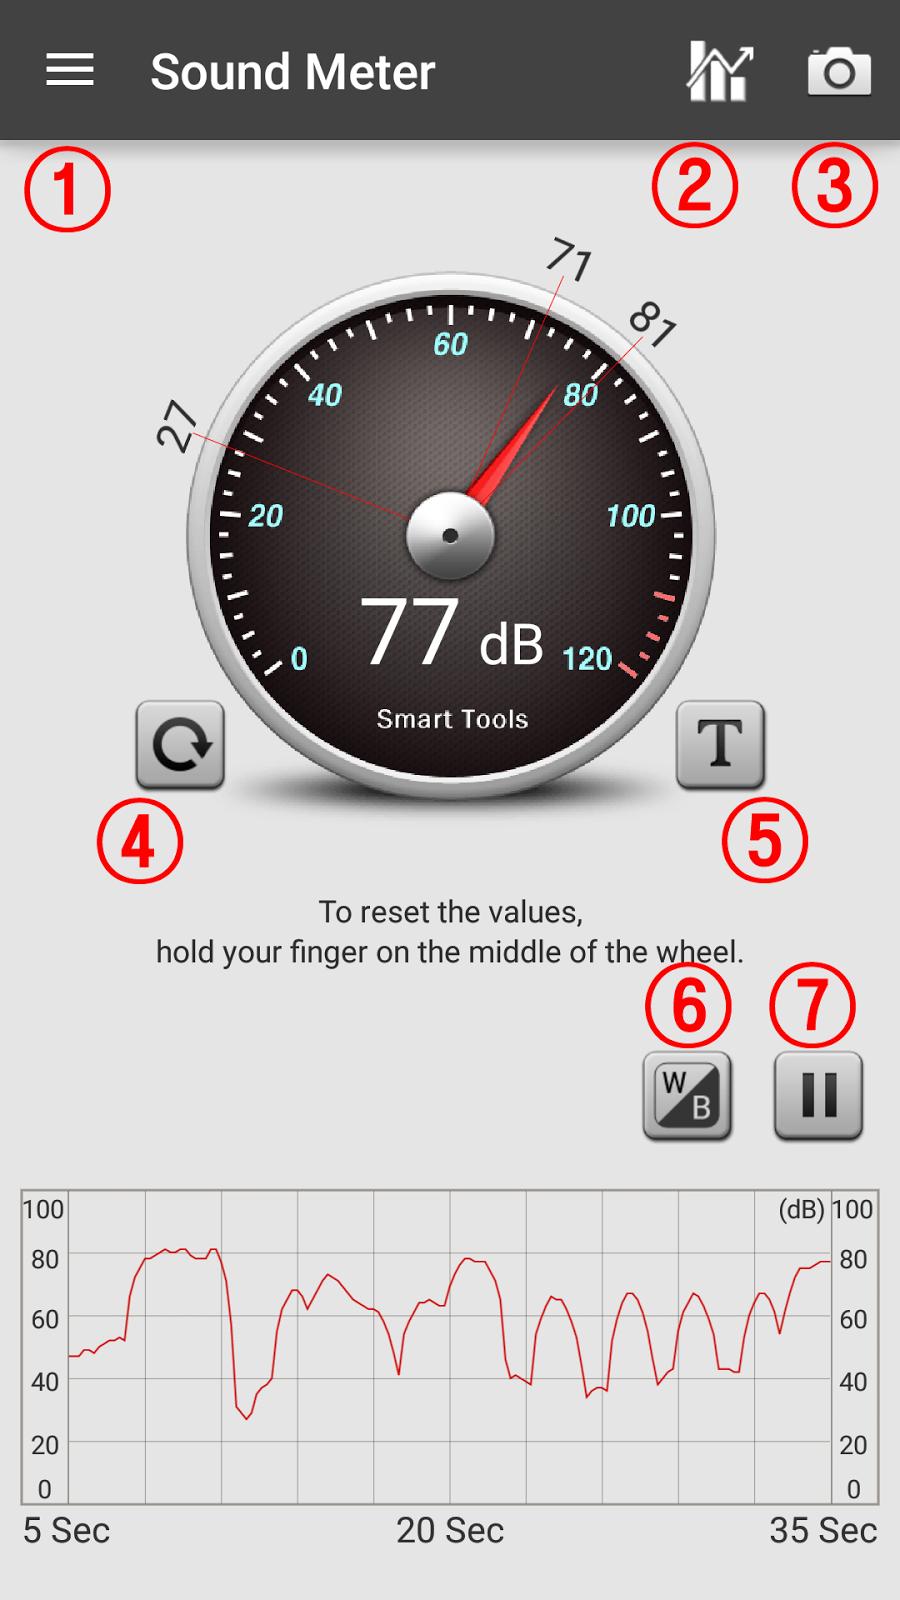 Android boy's Blog: Sound Meter Pro (v2 5) manual